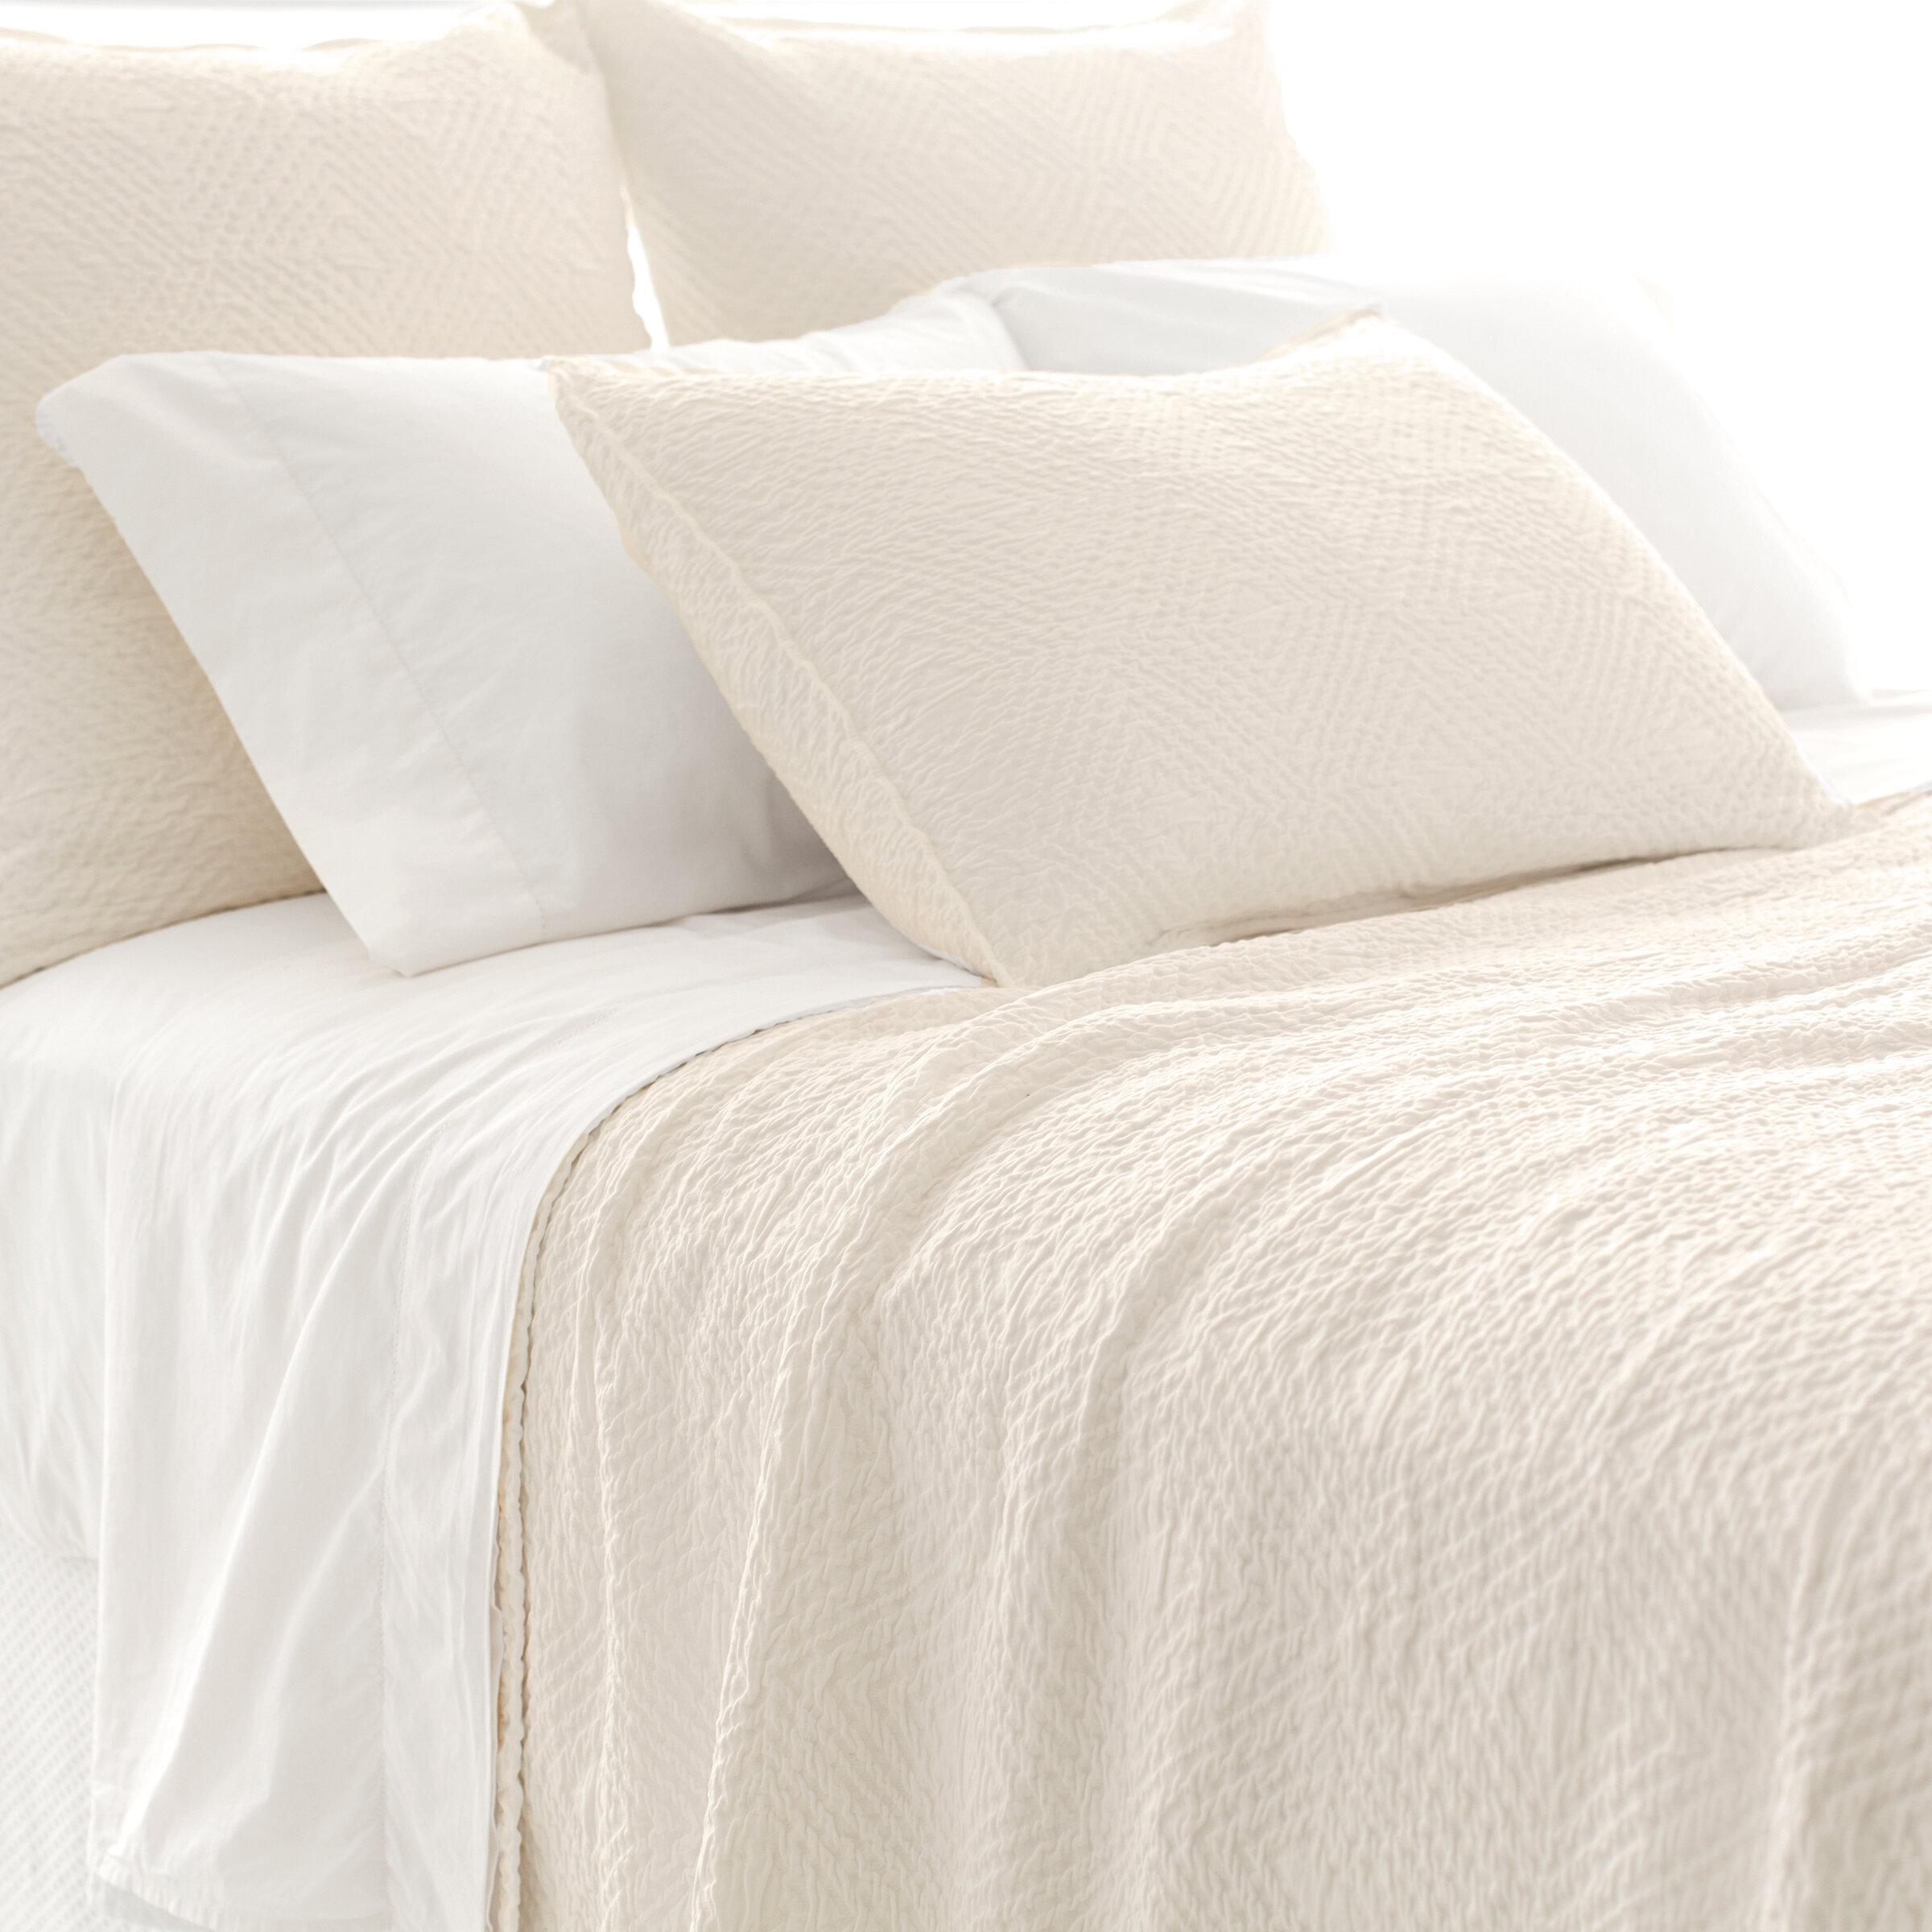 bed idea interesting regarding matelasse bedroom house your lightweight bedspread bedding sets provence